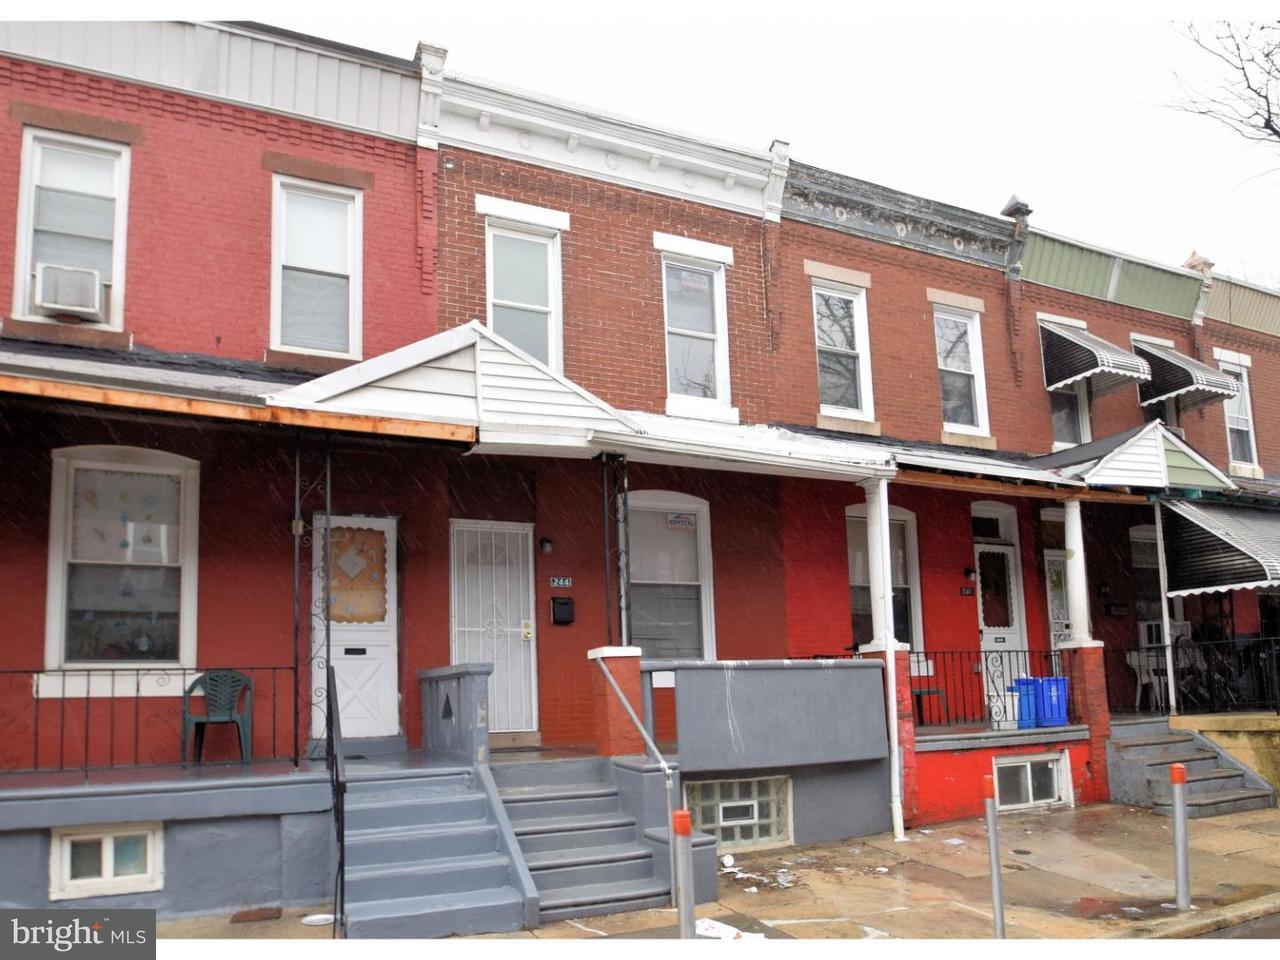 Townhouse for Rent at 244 N HOBART Street Philadelphia, Pennsylvania 19139 United States